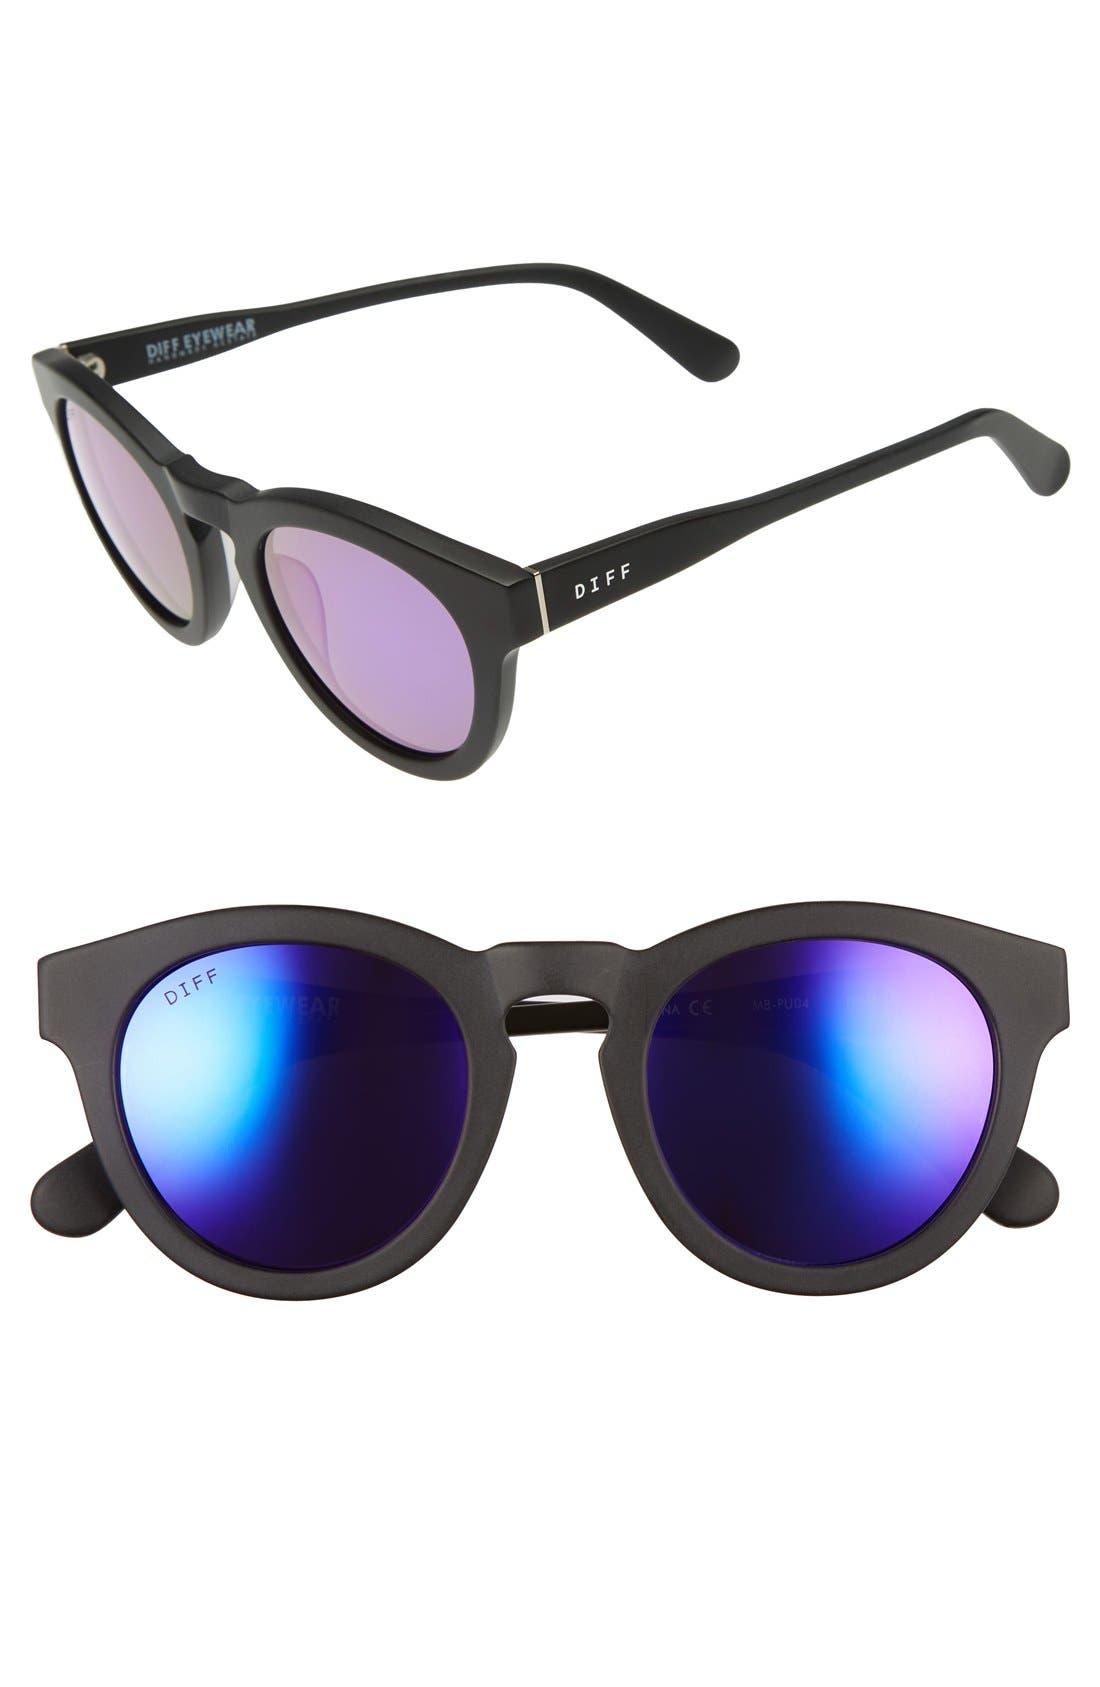 Main Image - DIFF Dime II 48mm Retro Sunglasses